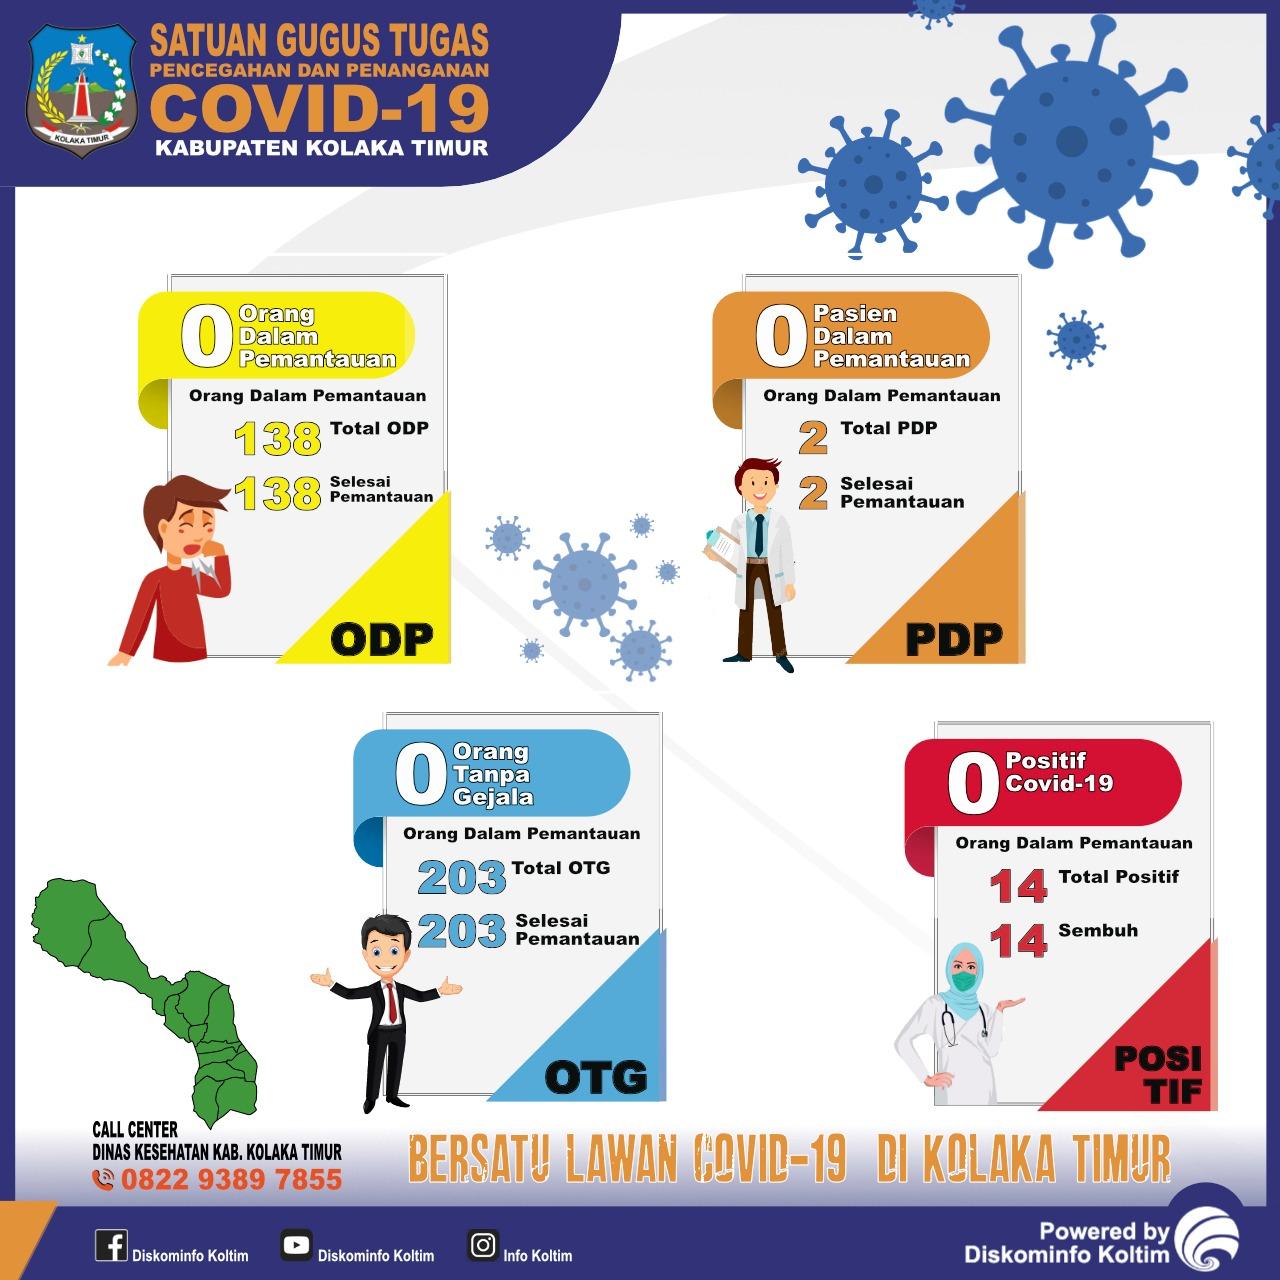 DATA COVID-19 KAB. KOLAKA TIMUR TANGGAL 16 JULI 2020